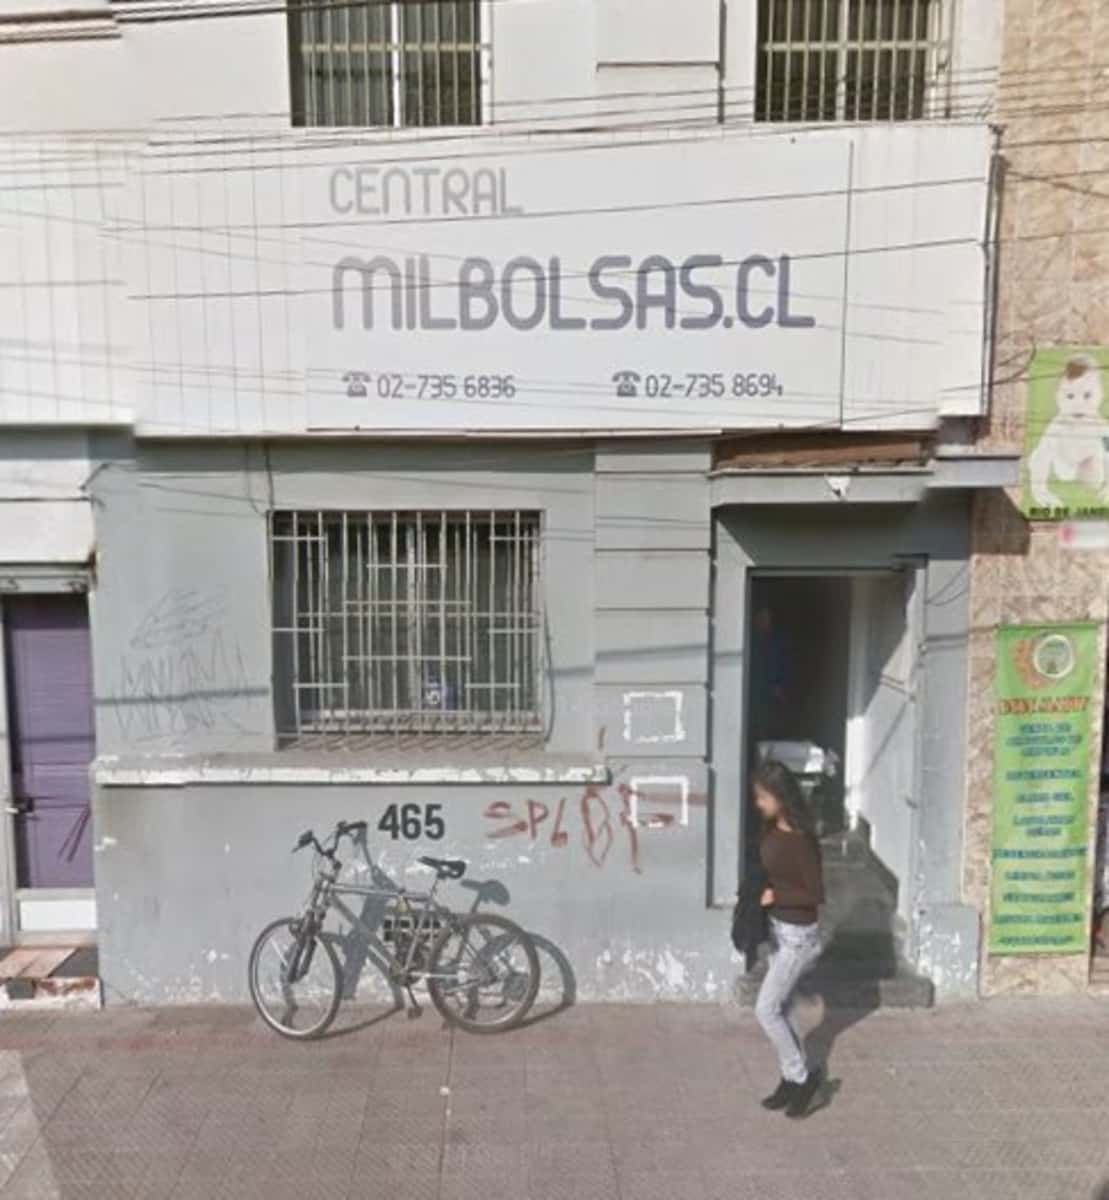 MilbolsasFábrica De 465 En Plásticas Janeiro Río Bolsas N° b6yYf7gv